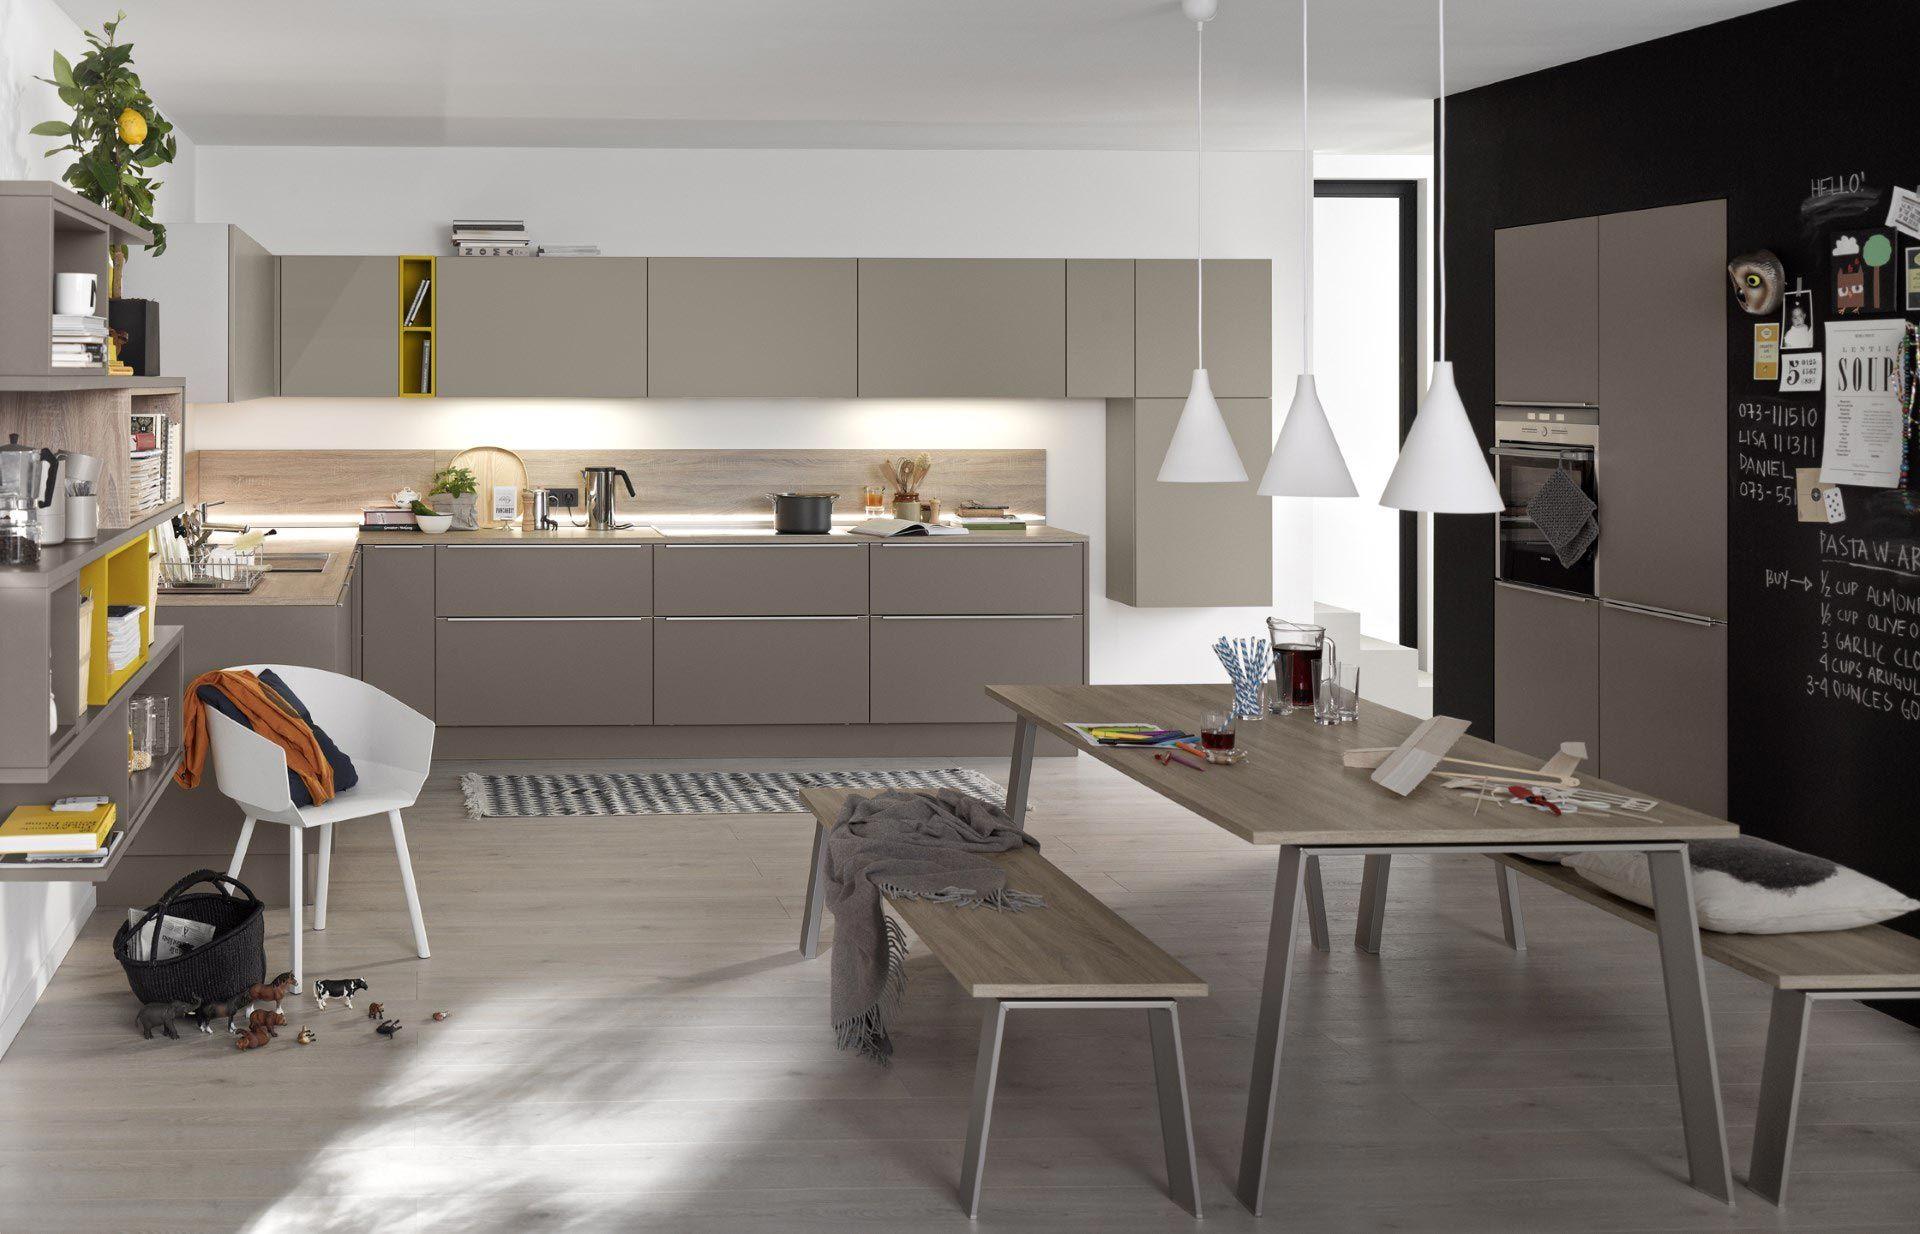 Innova Küchenplaner ~ Http: www.webplaner innoplus.de innova nolte2 3dsummary.jspw